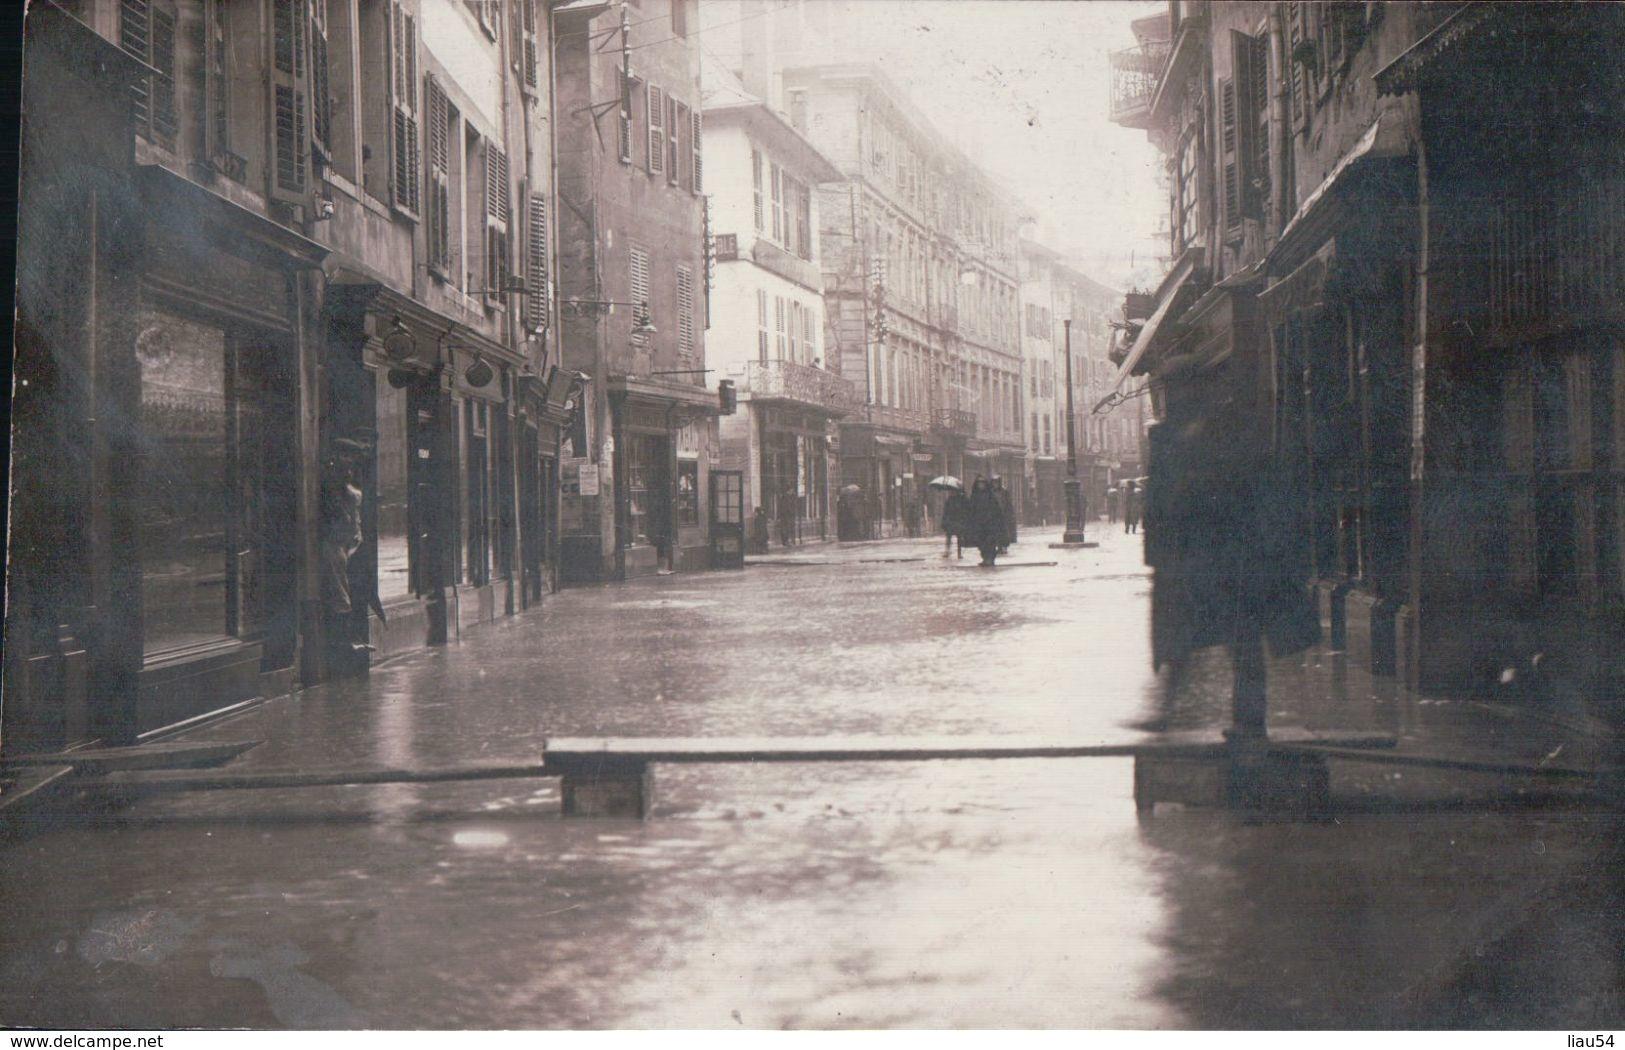 CARTE-PHOTO Chambéry Le 21 01 1910 Inondations - Chambery